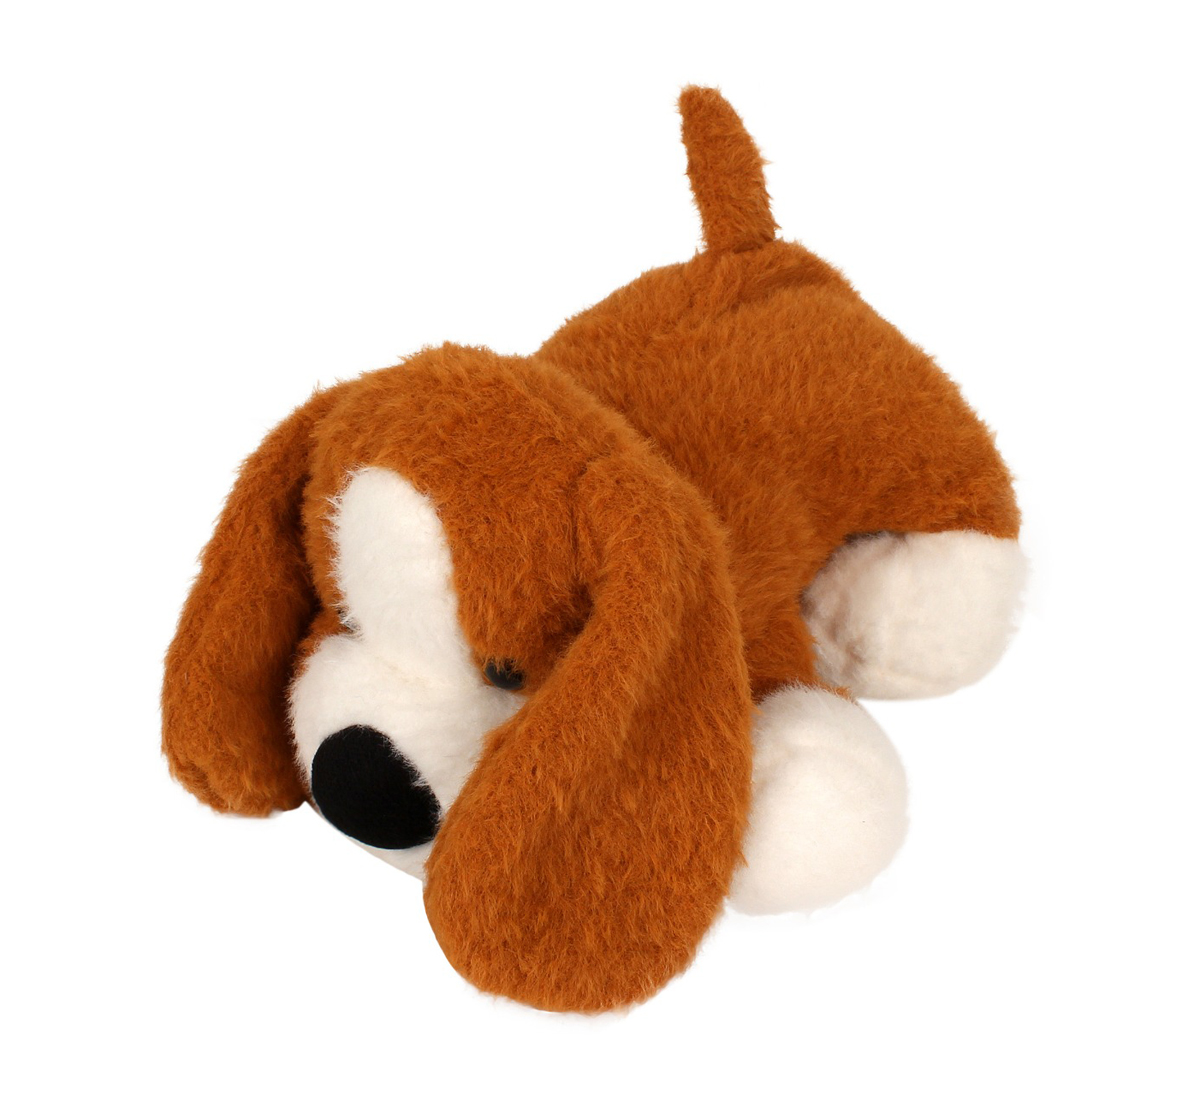 Fuzzbuzz | Fuzzbuzz Soft Lying Dog - Lt. Brown - 33Cm Quirky Soft Toys for Kids age 0M+ - 15 Cm (Light Brown)